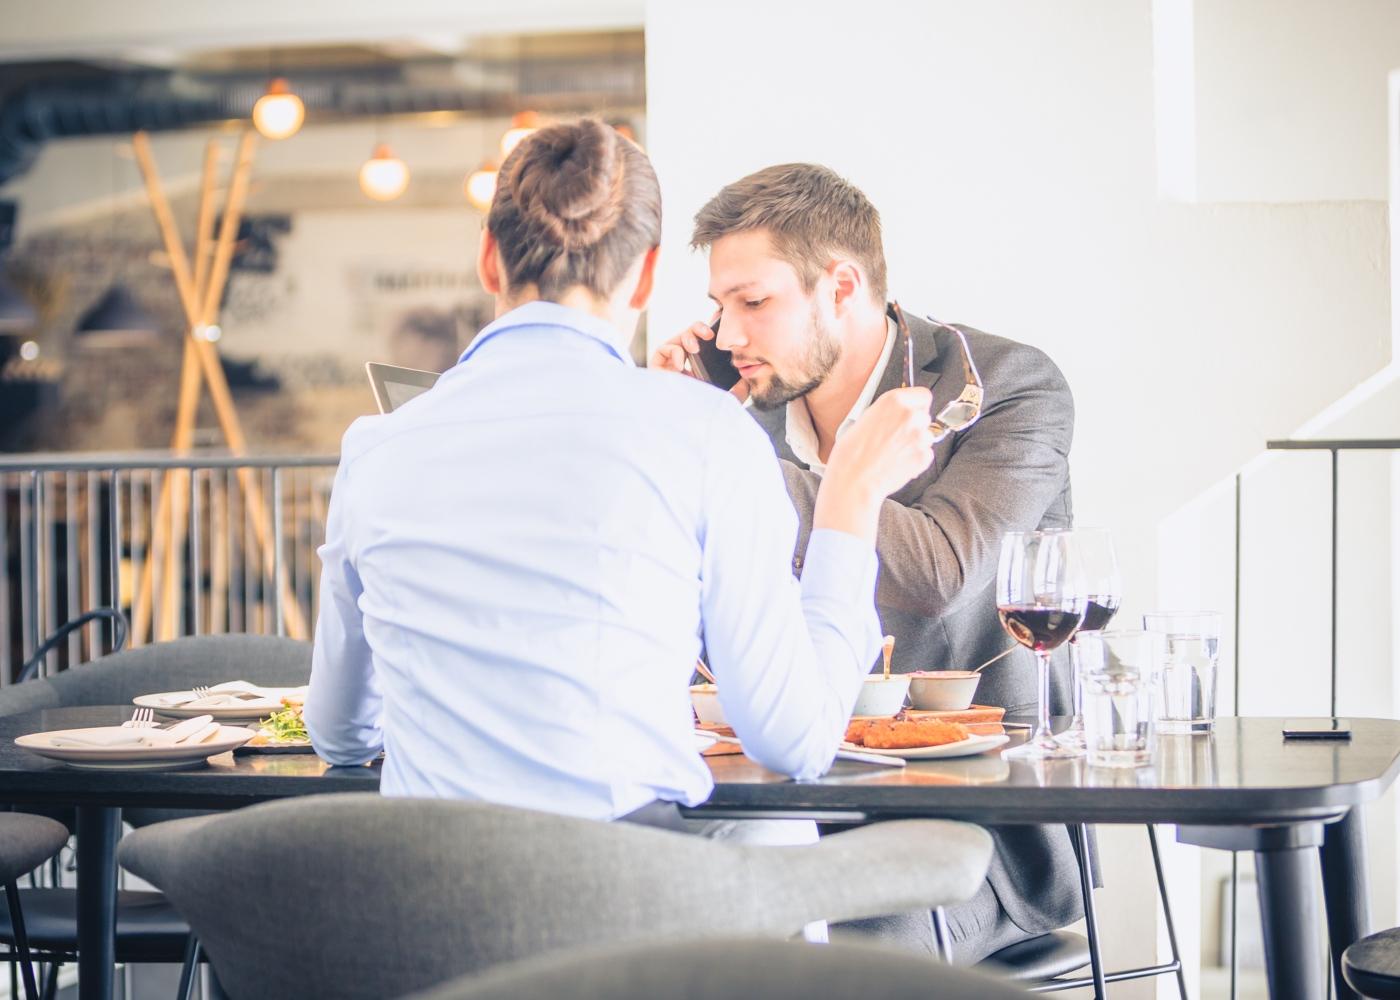 Casal a almoçar num restaurante